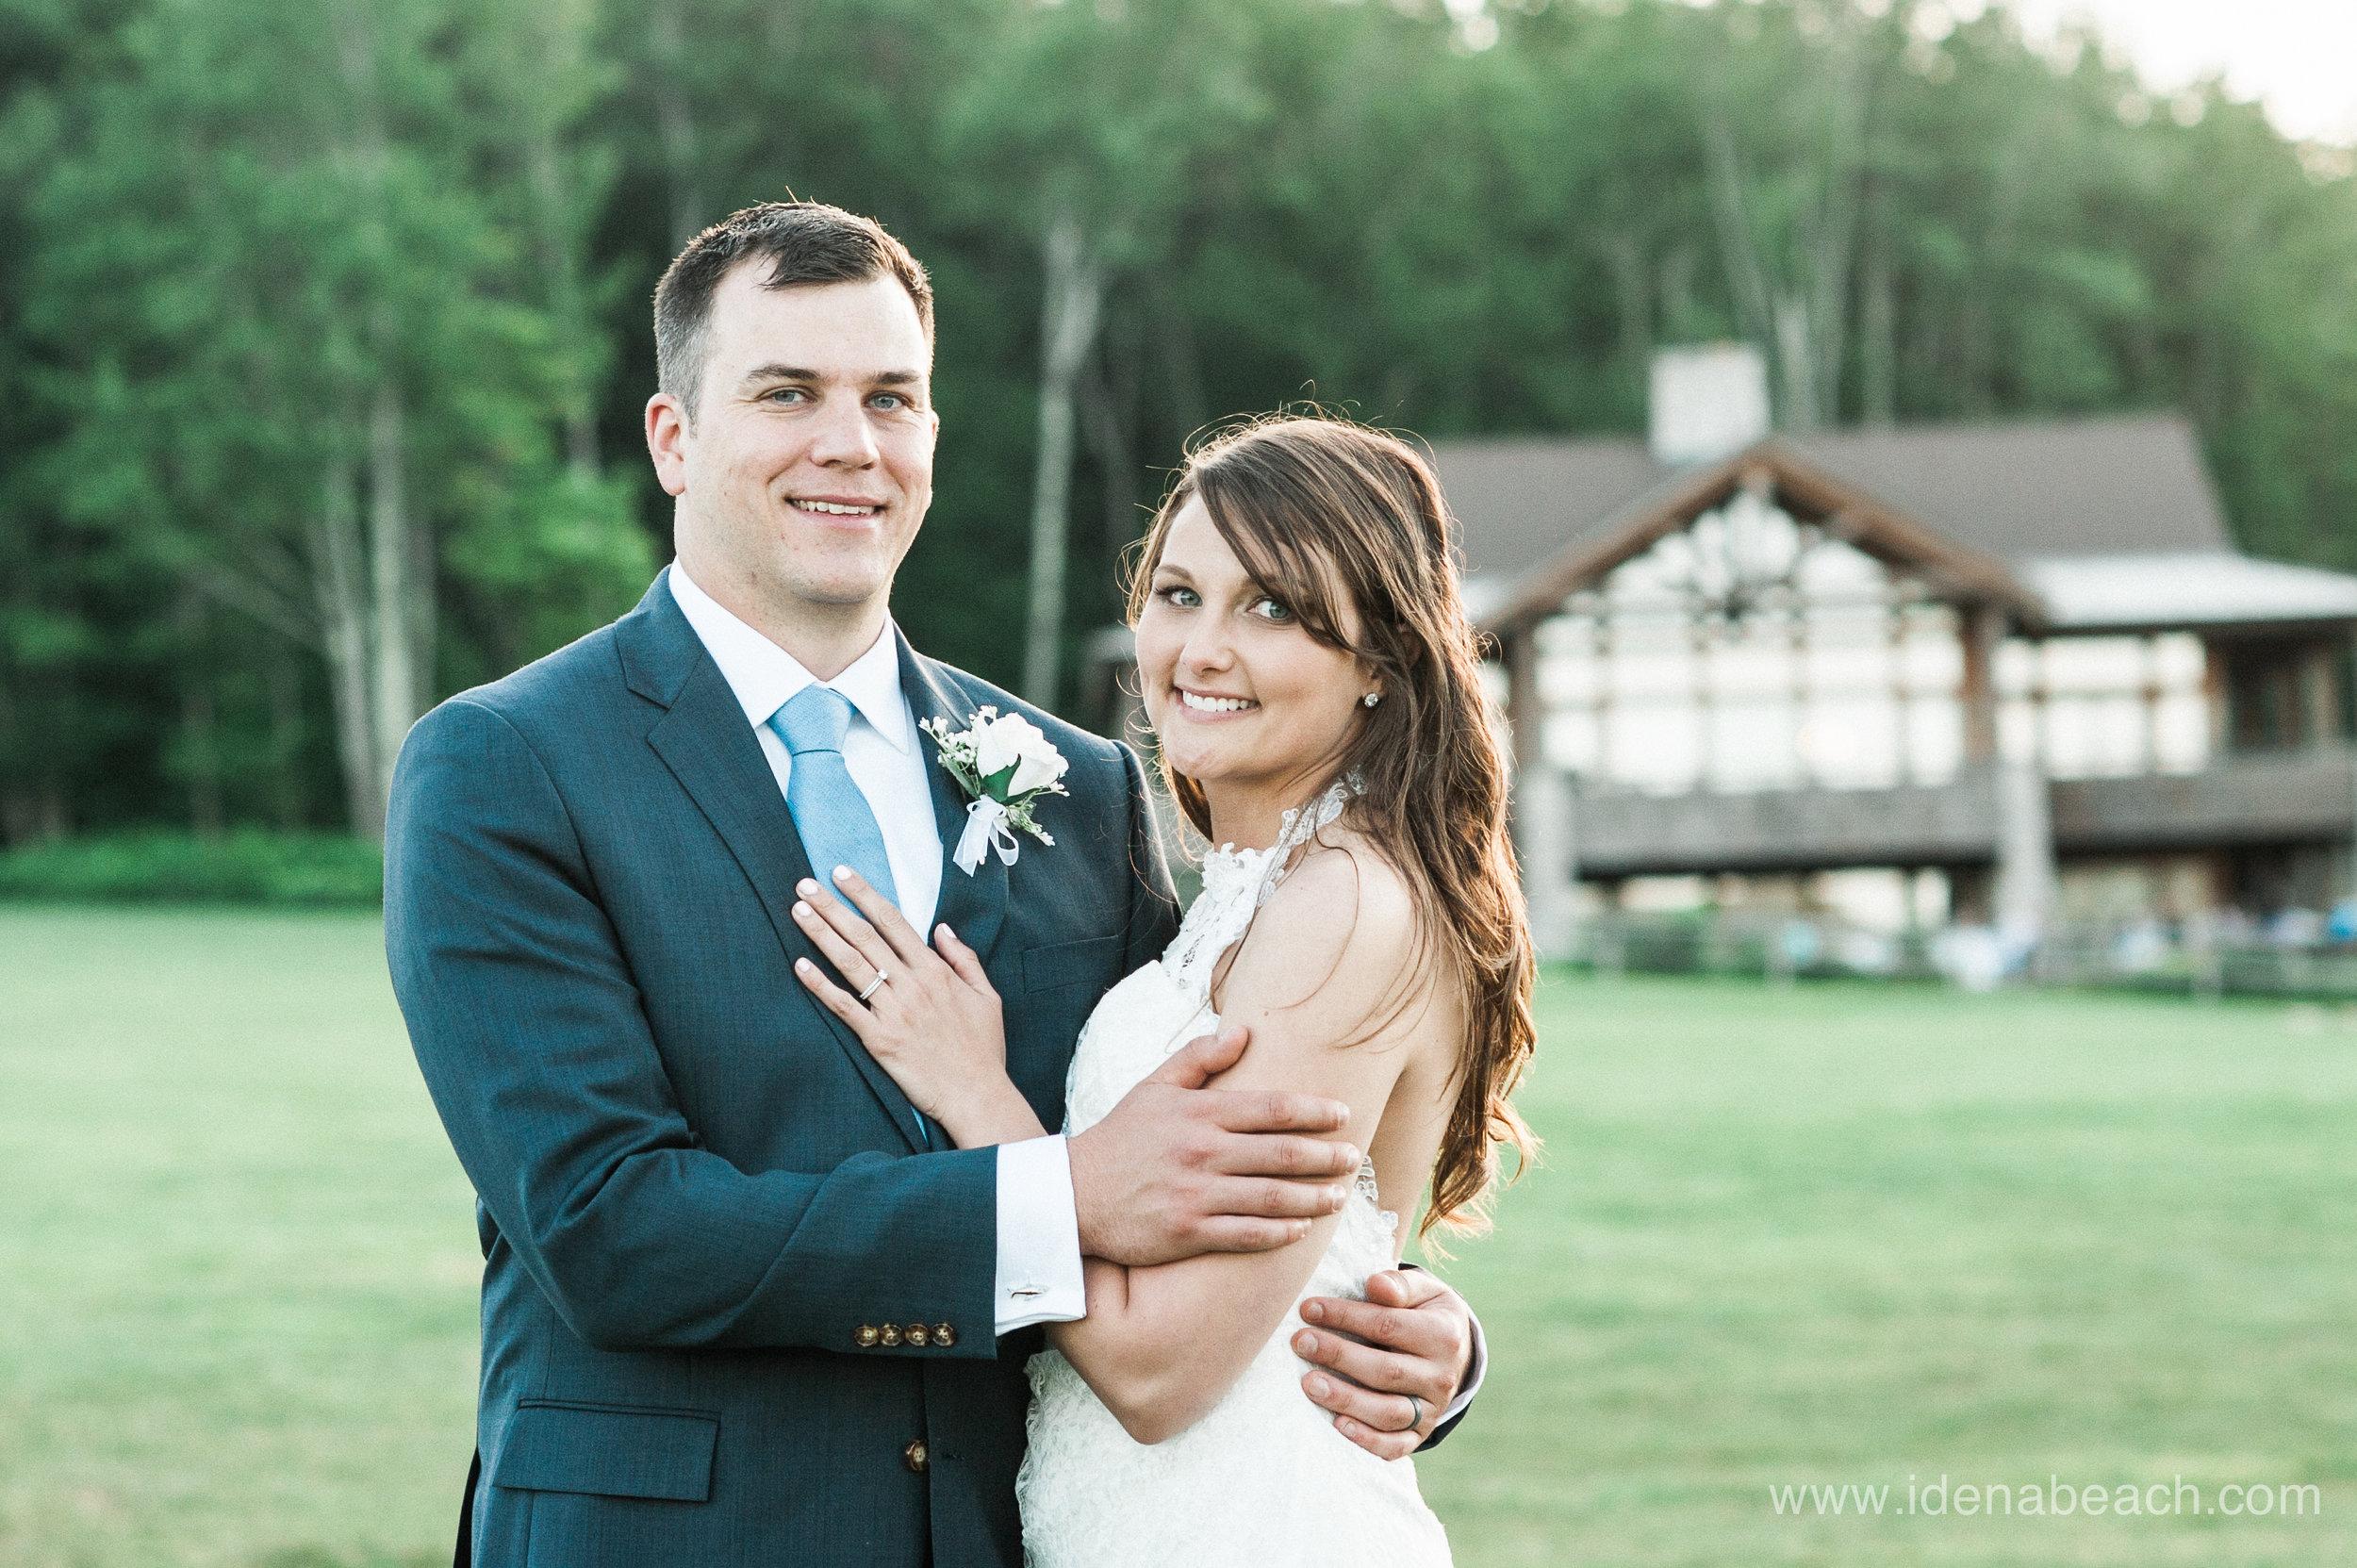 Mountain-Top-Inn-Vermont-Wedding-Photographer-139.jpg